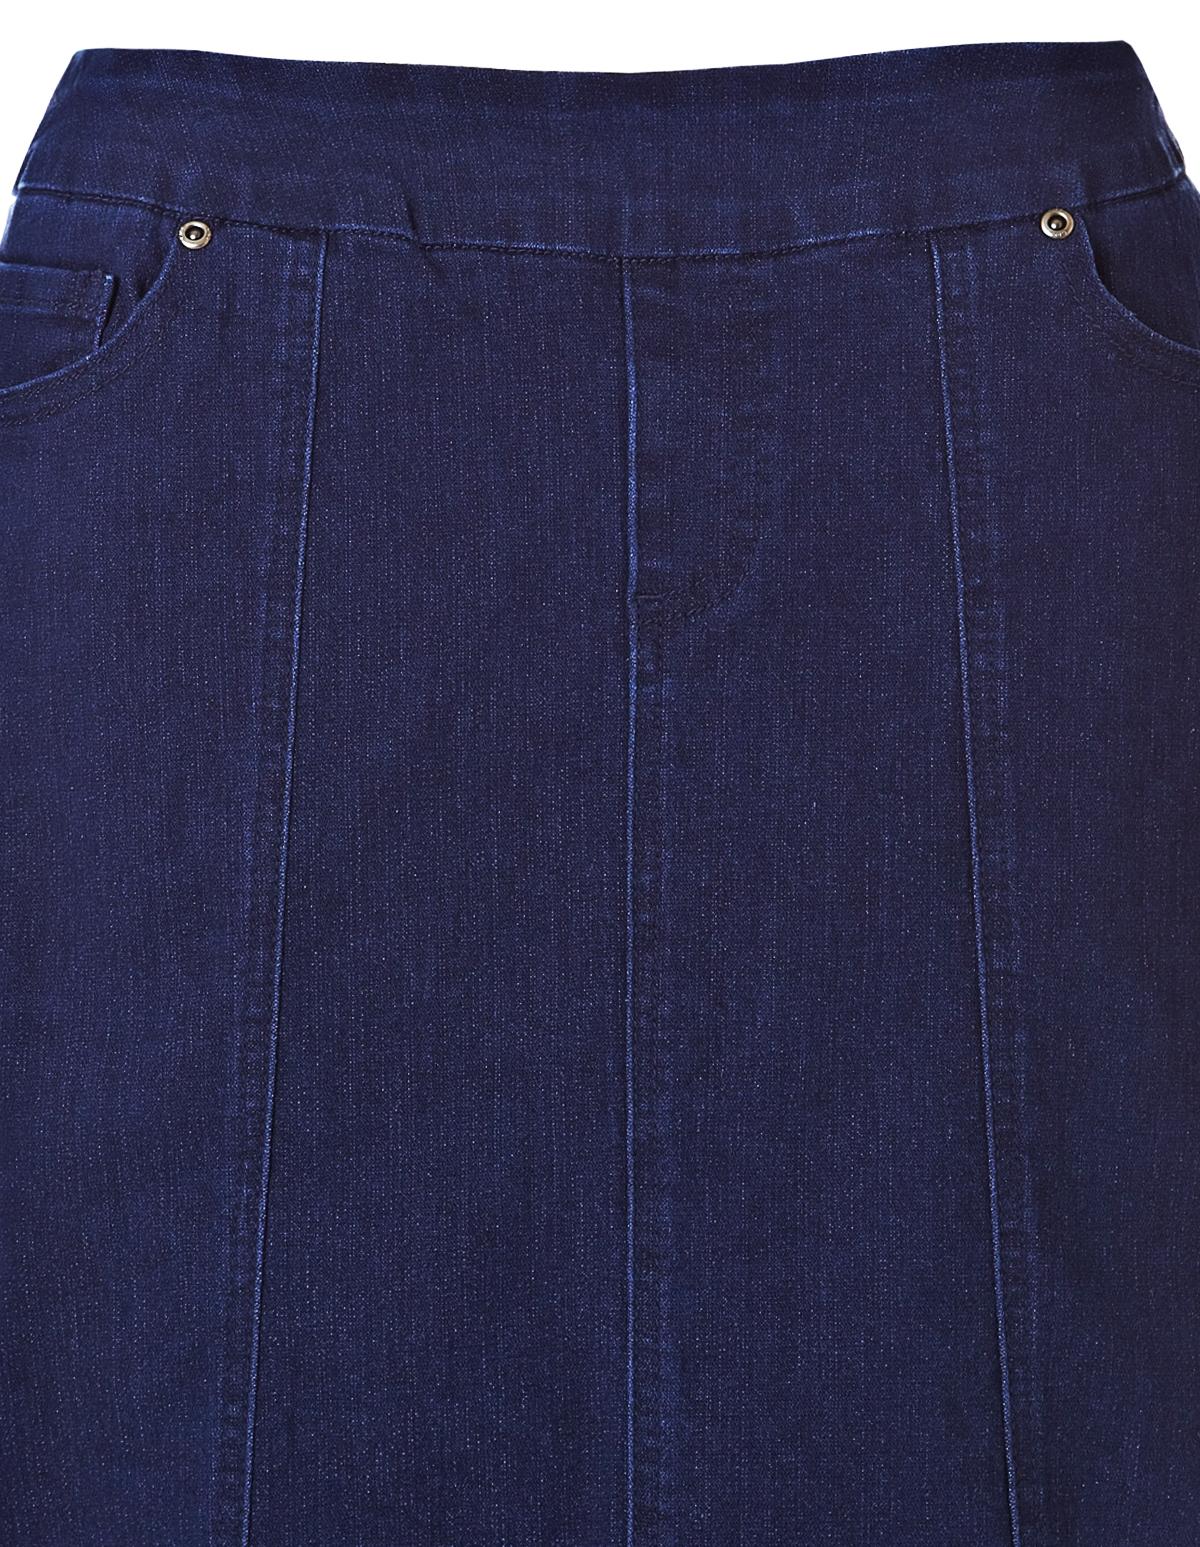 Pull-On Dark Denim Jean Skirt | Cleo